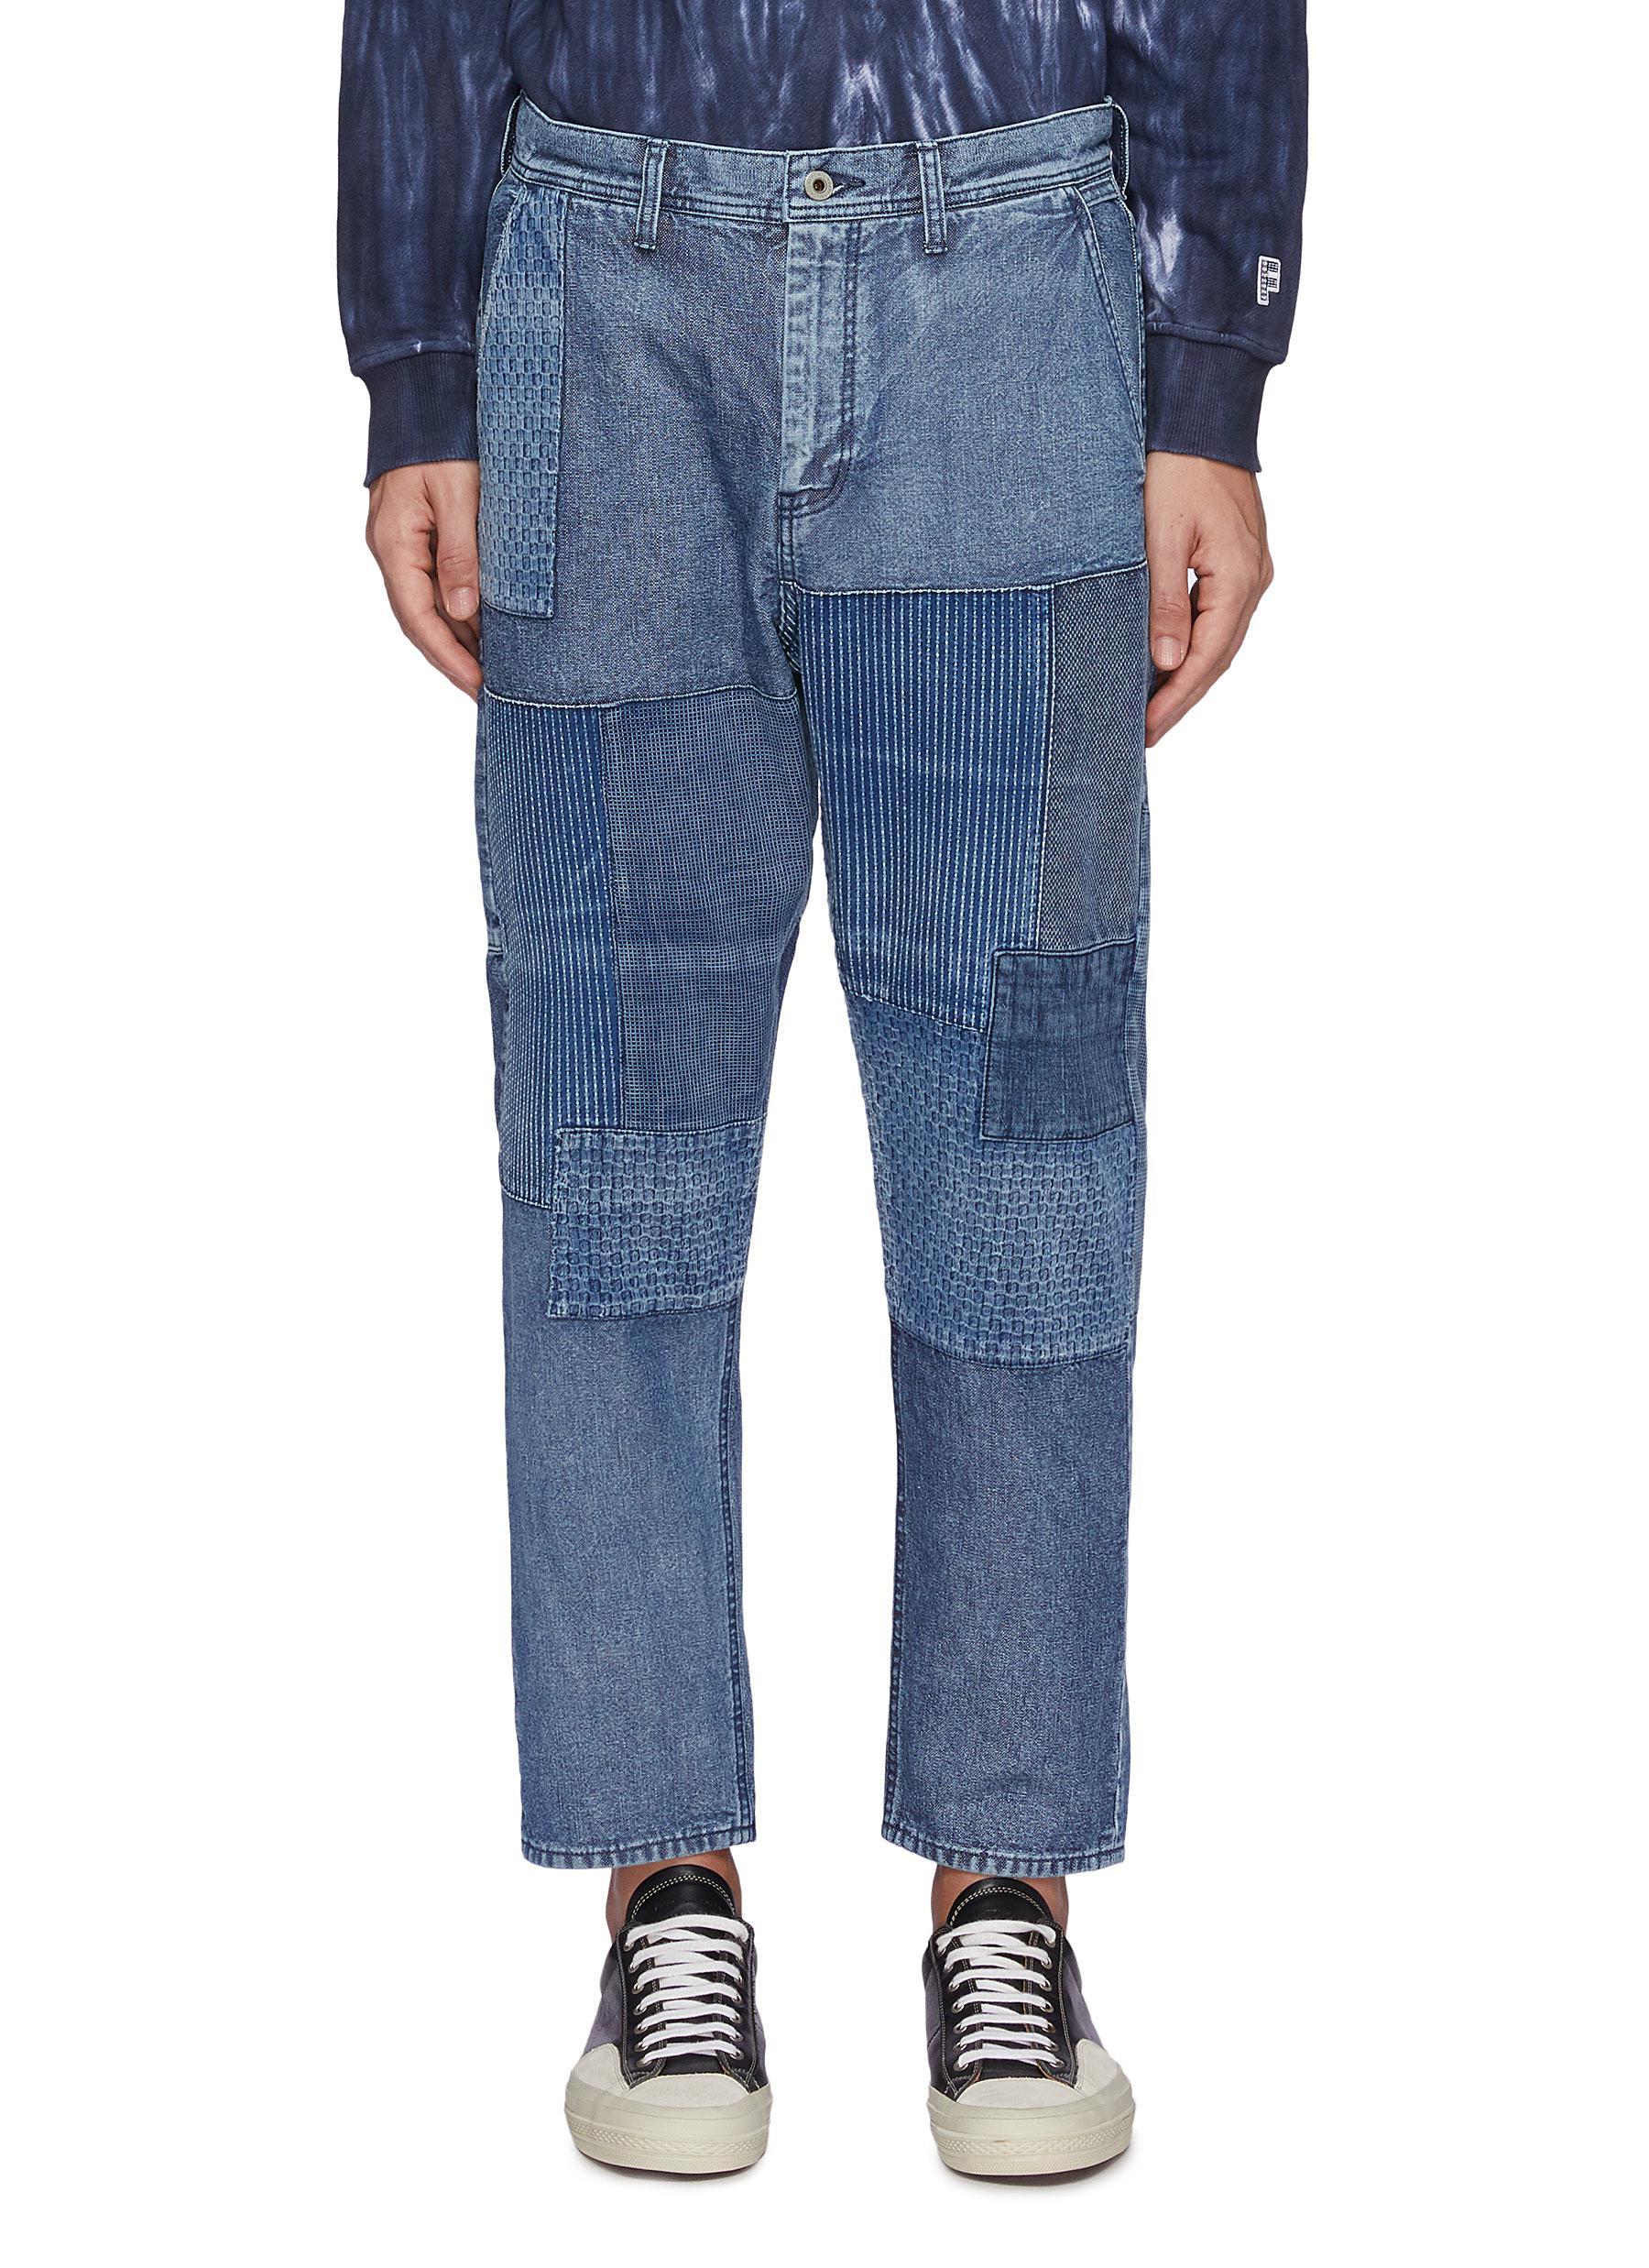 Tonal Boro Patchwork Washed Straight Leg Jeans